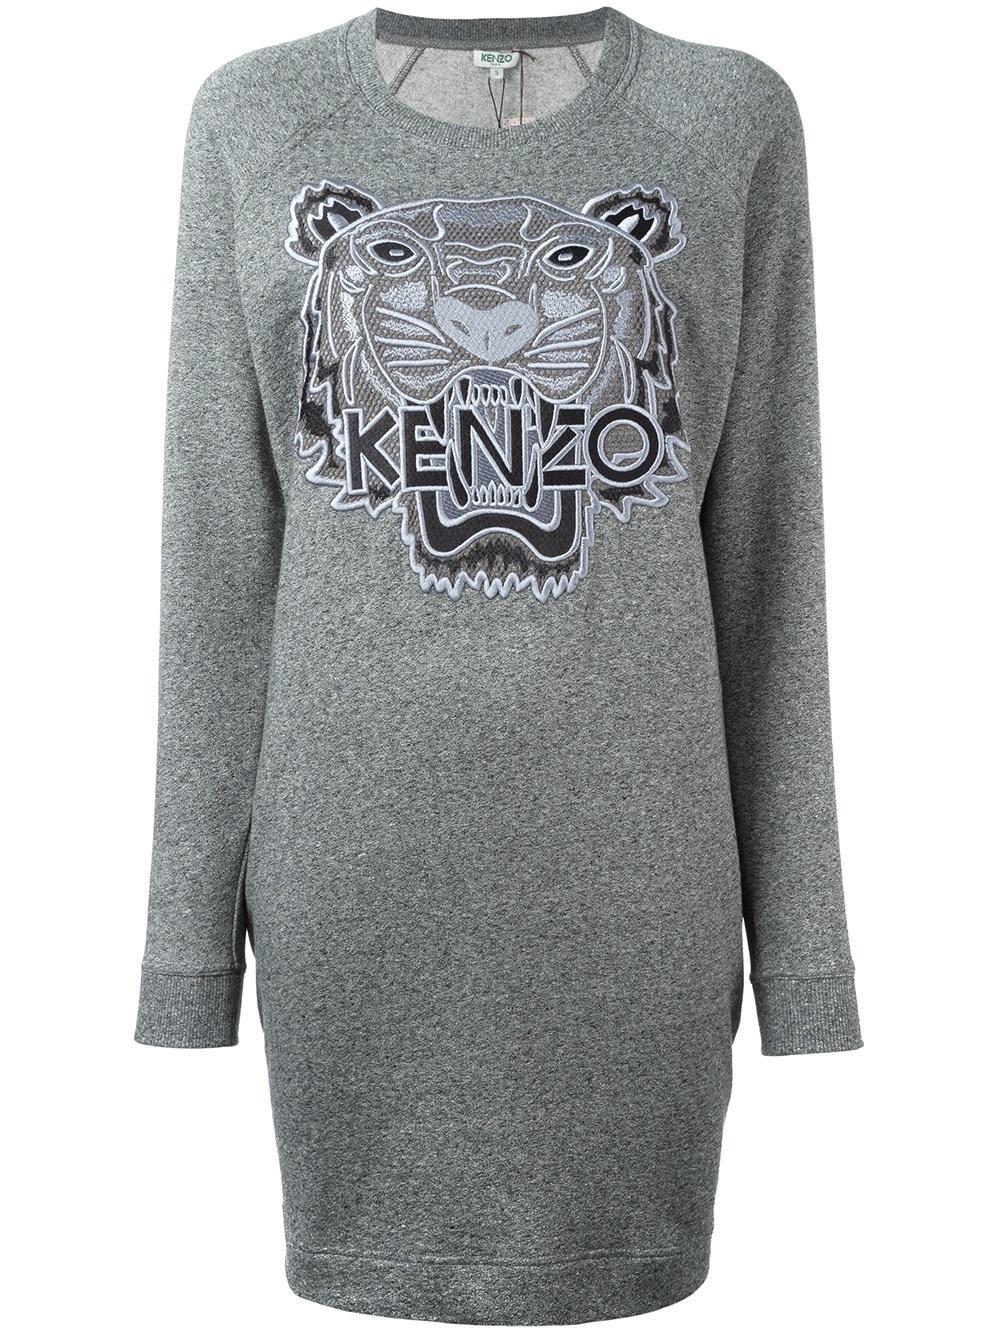 Sweat shirt kenzo femme solde